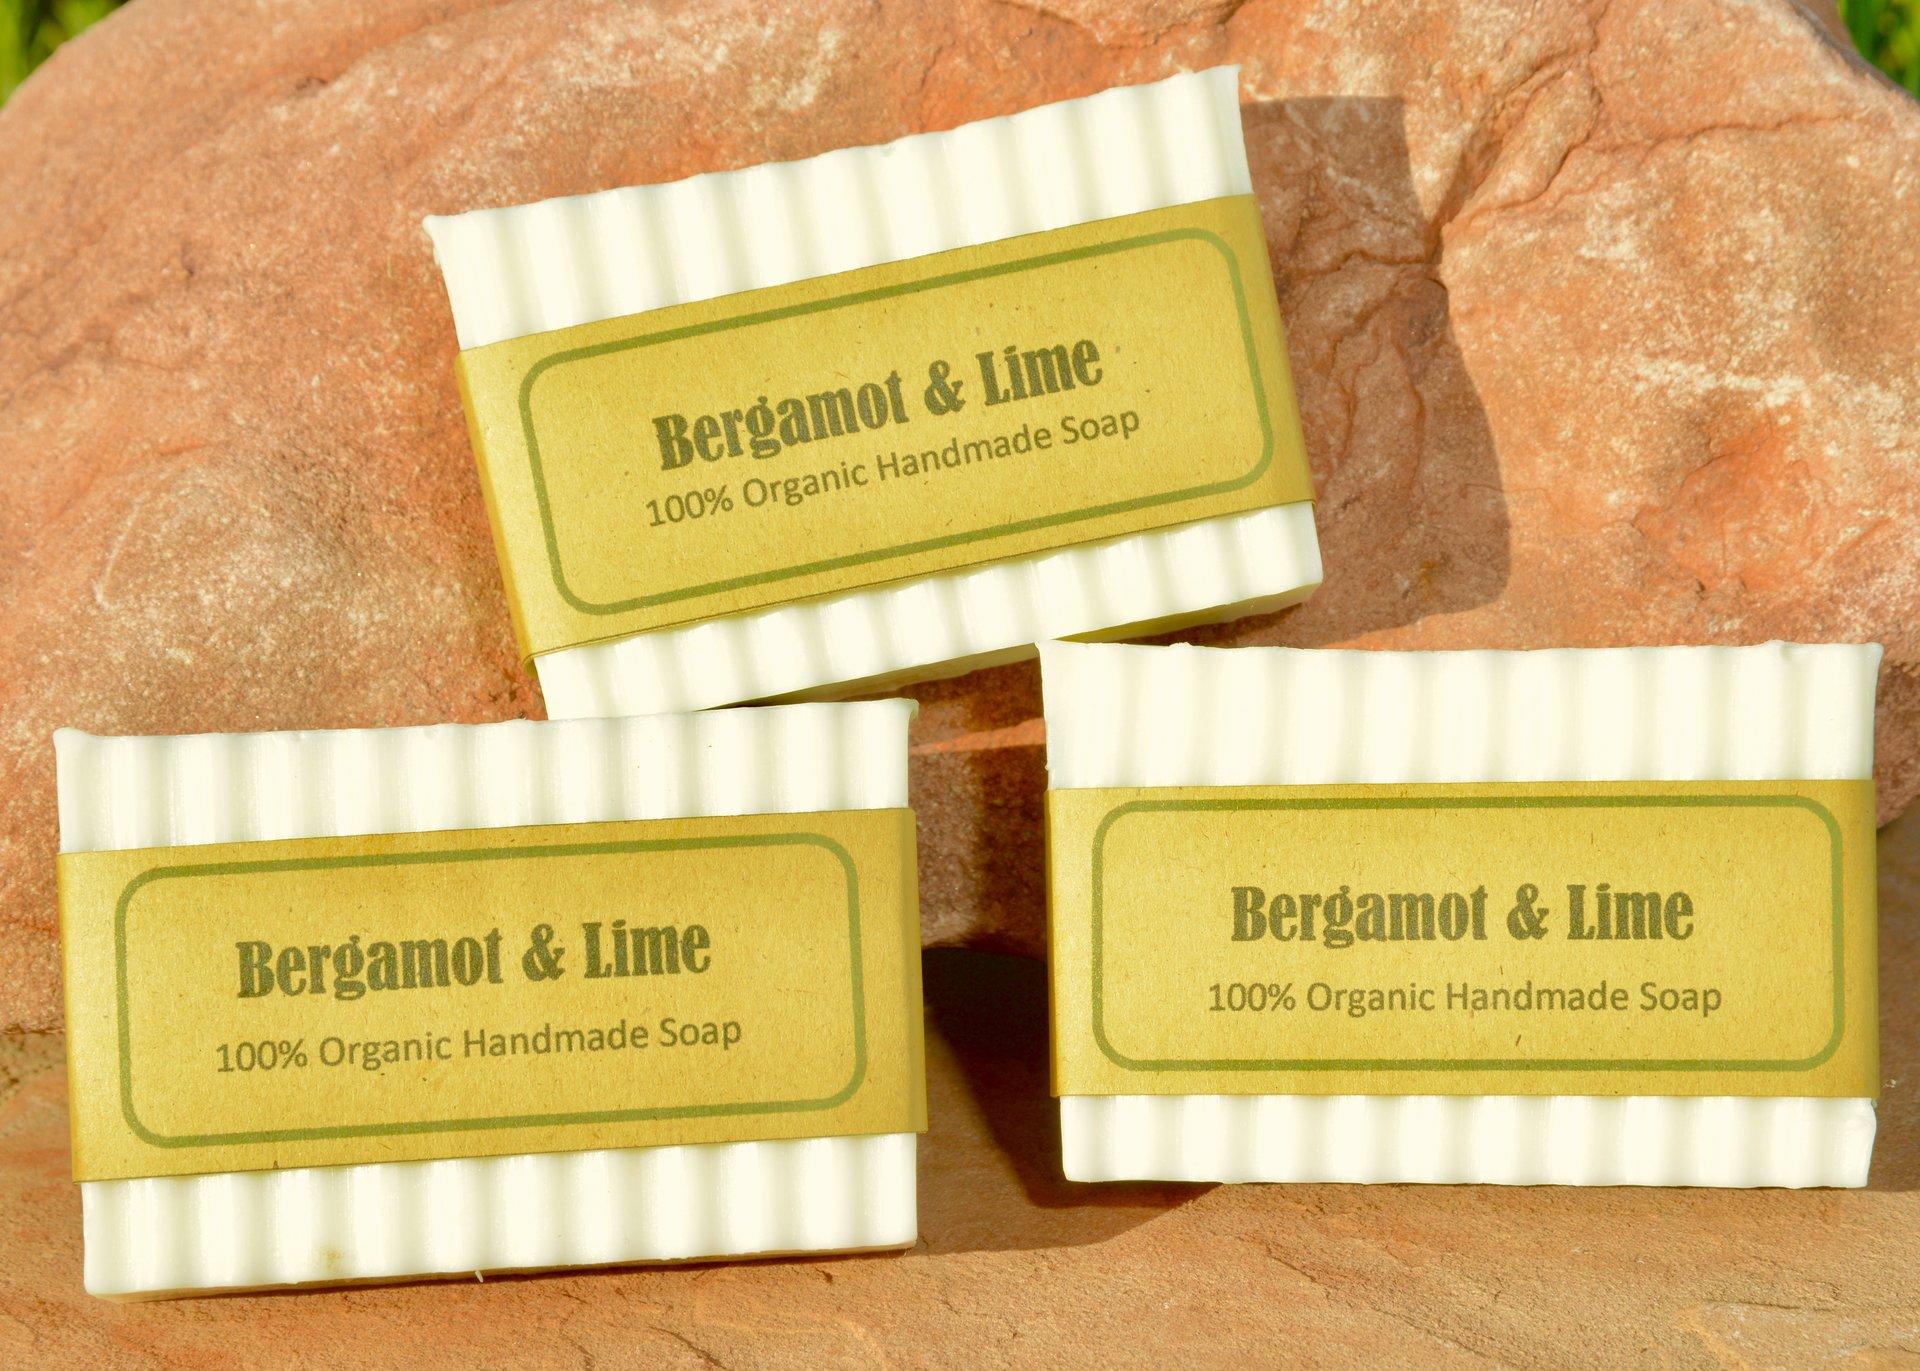 Bregamot and Lime organic soap